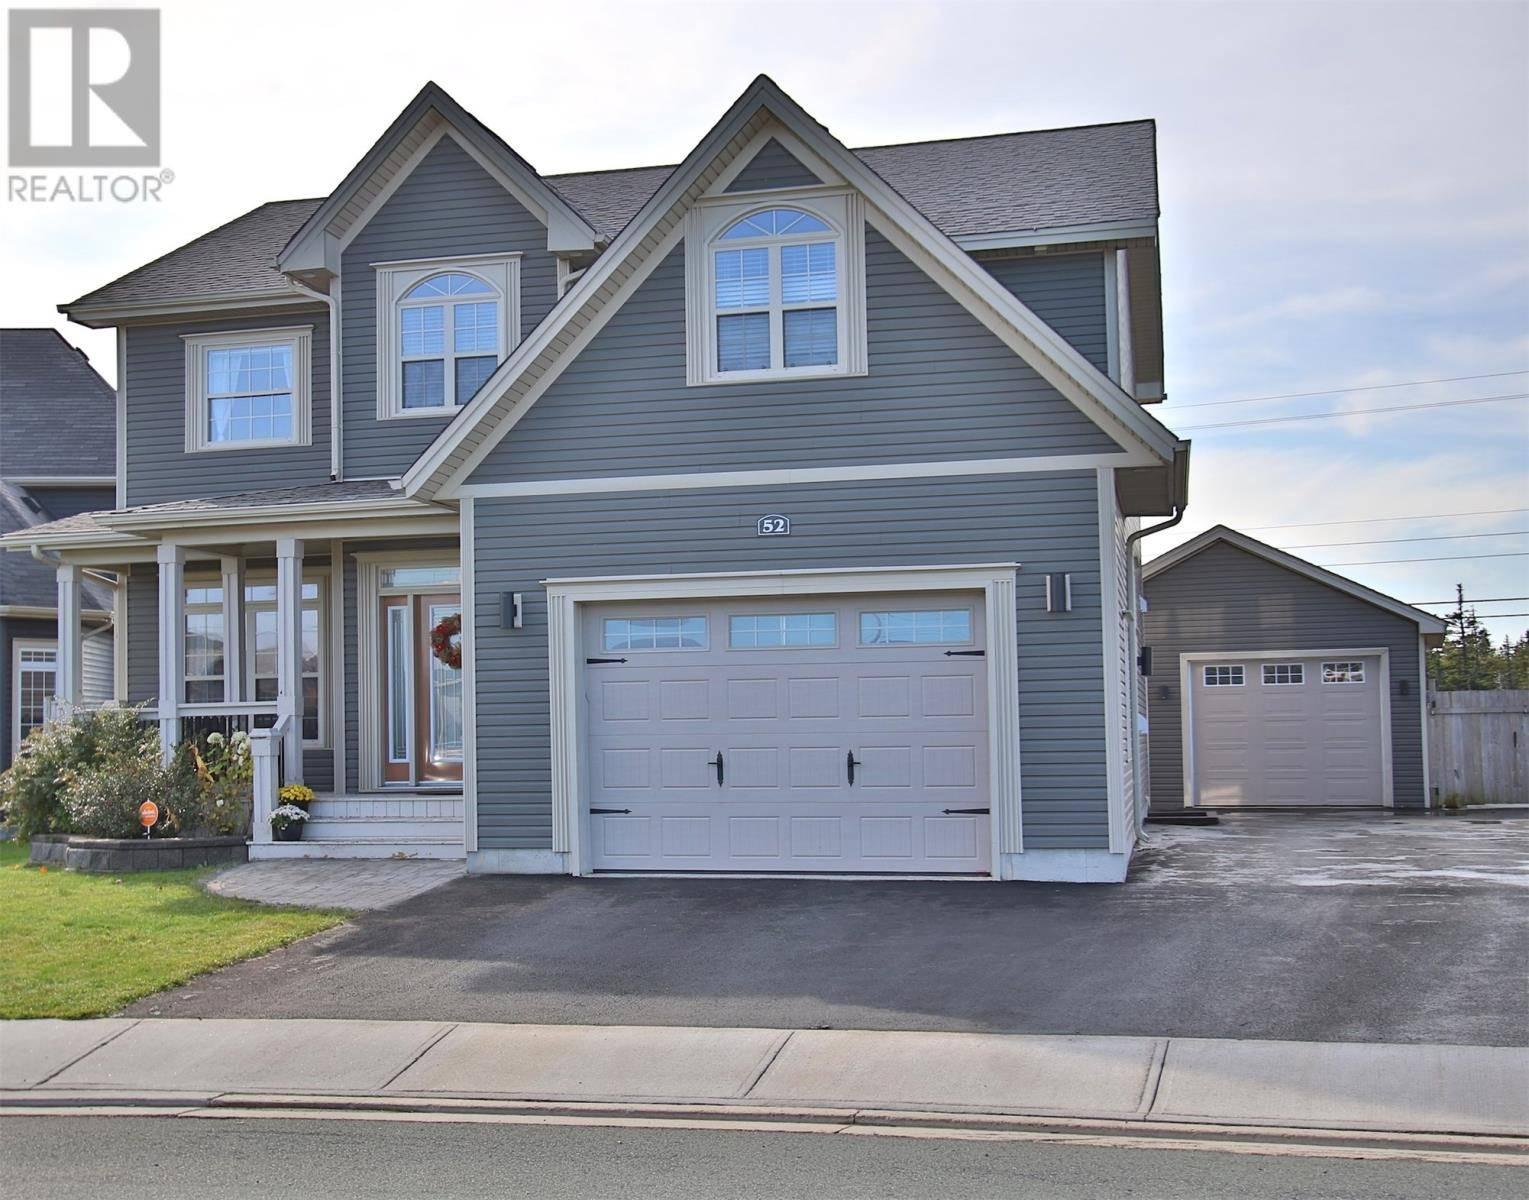 House for sale at 52 Kenai Cres St. John's Newfoundland - MLS: 1205588